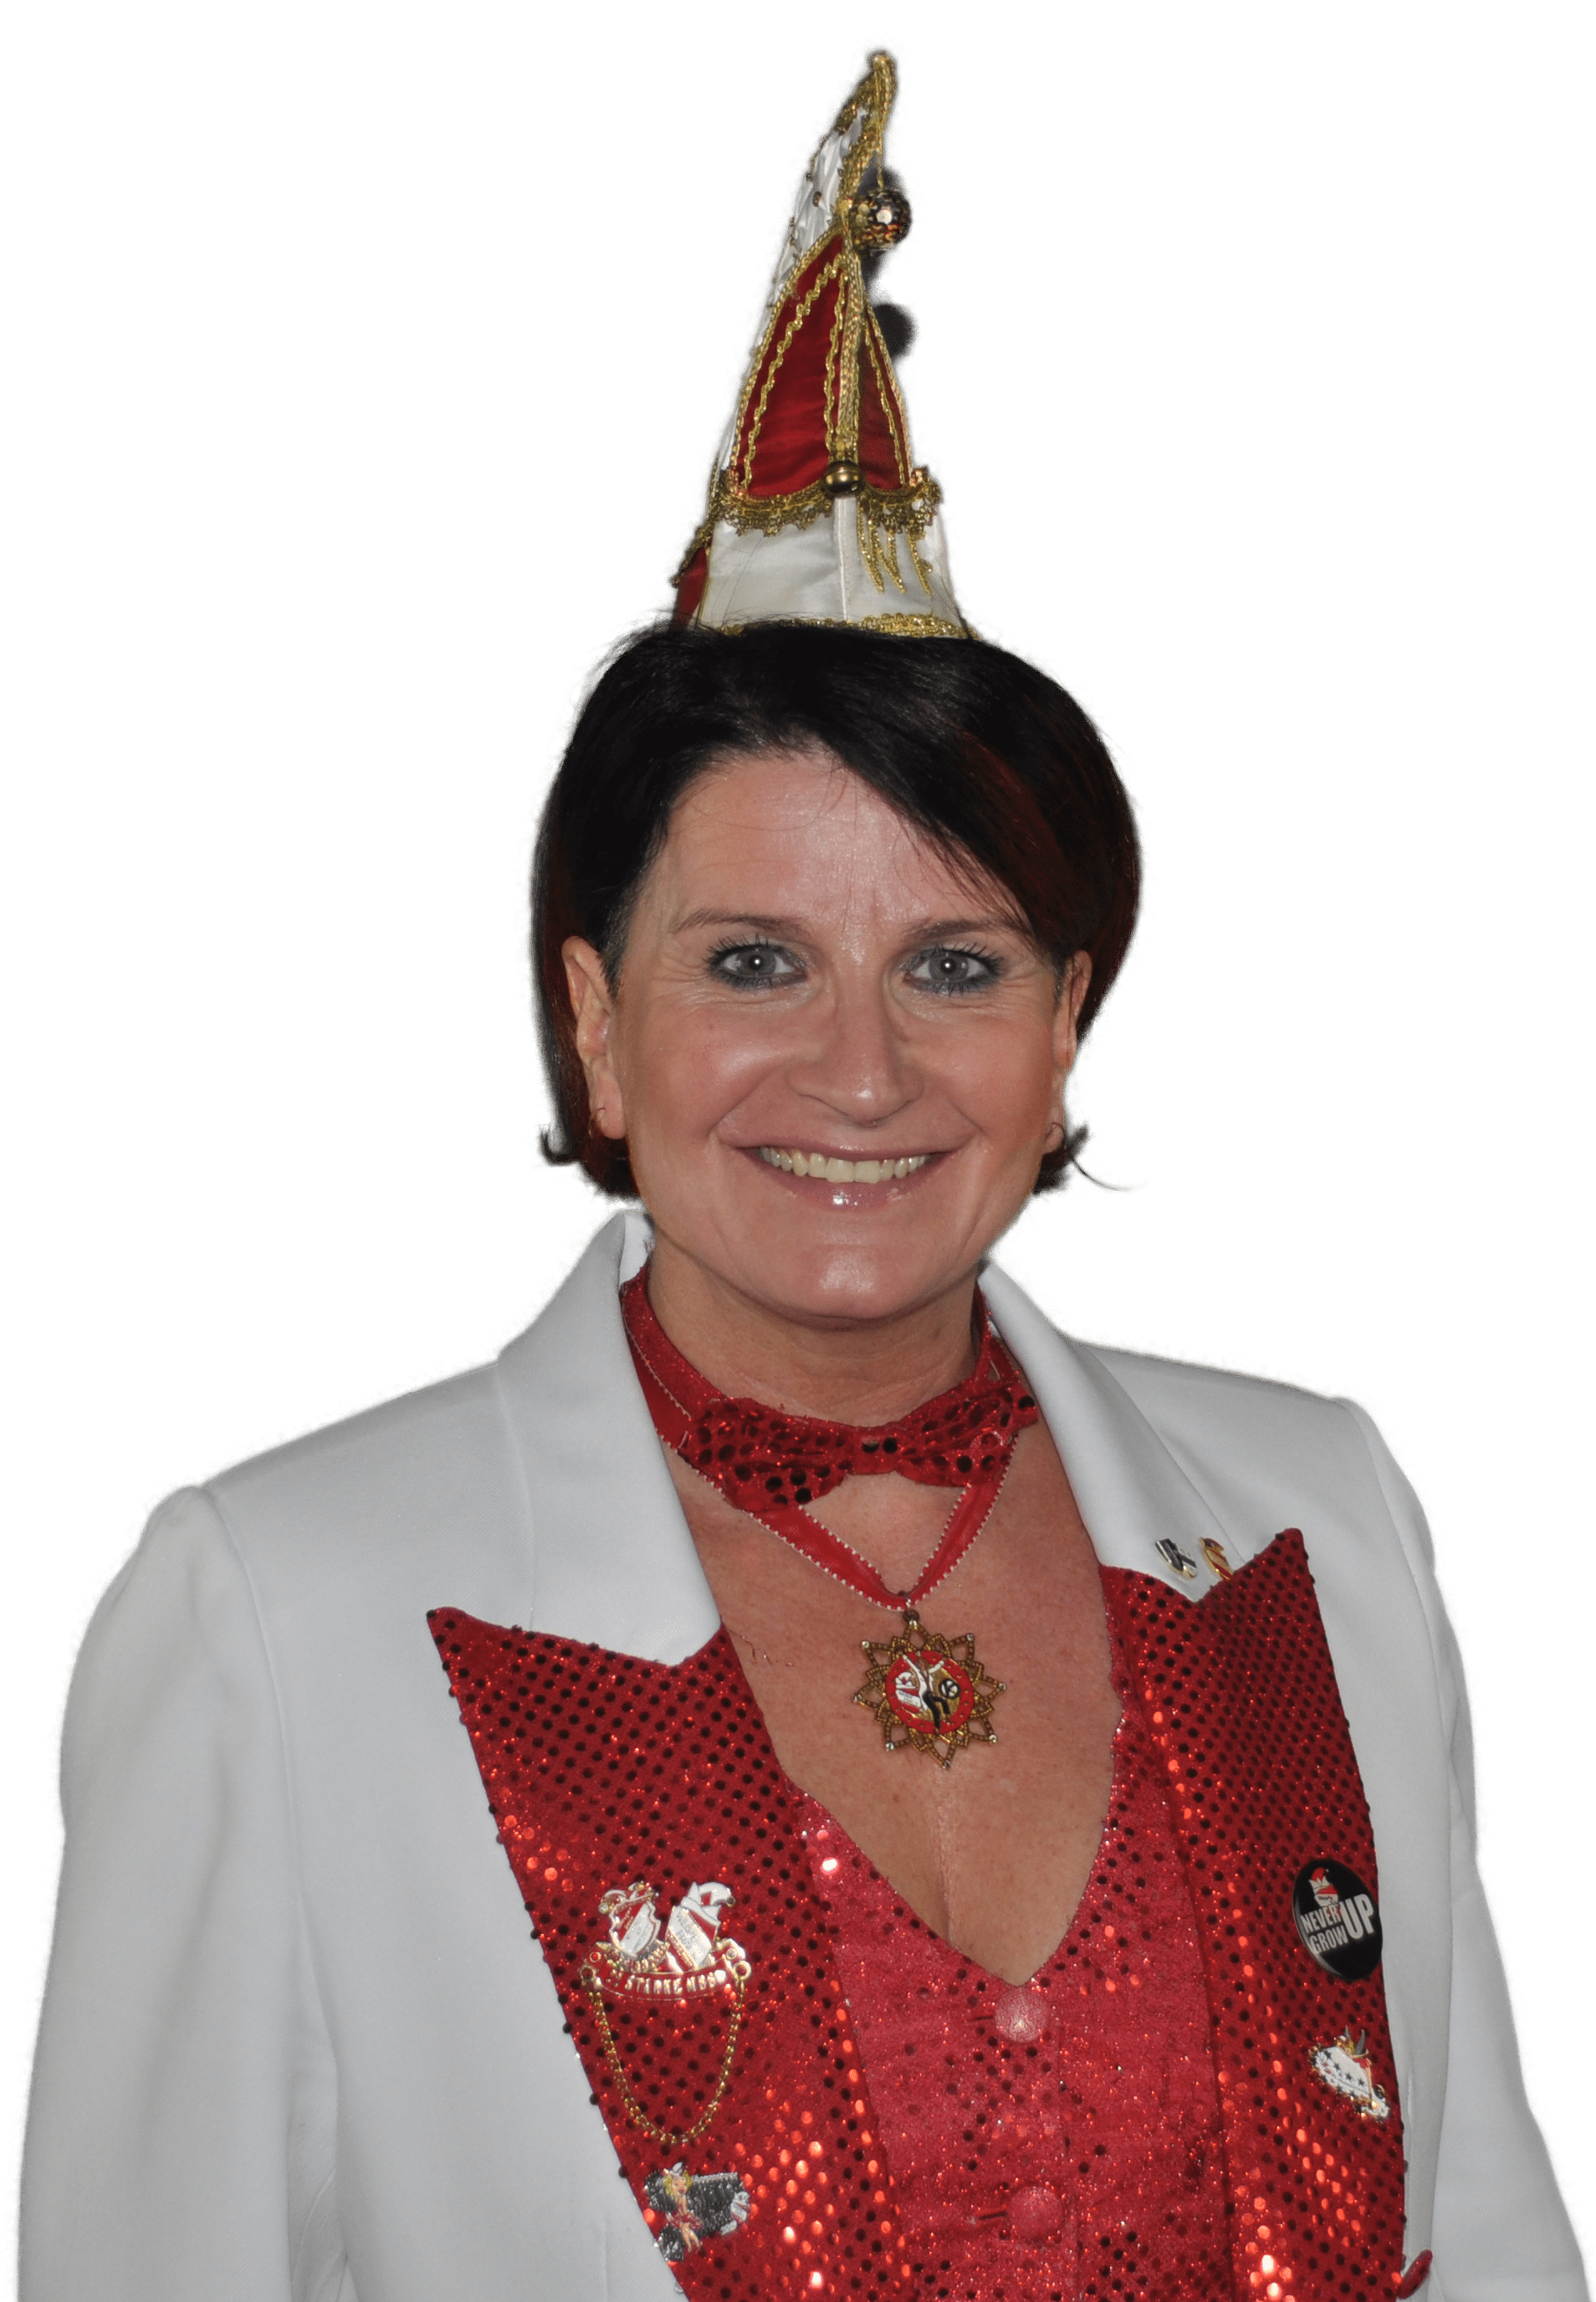 Annette Henschel